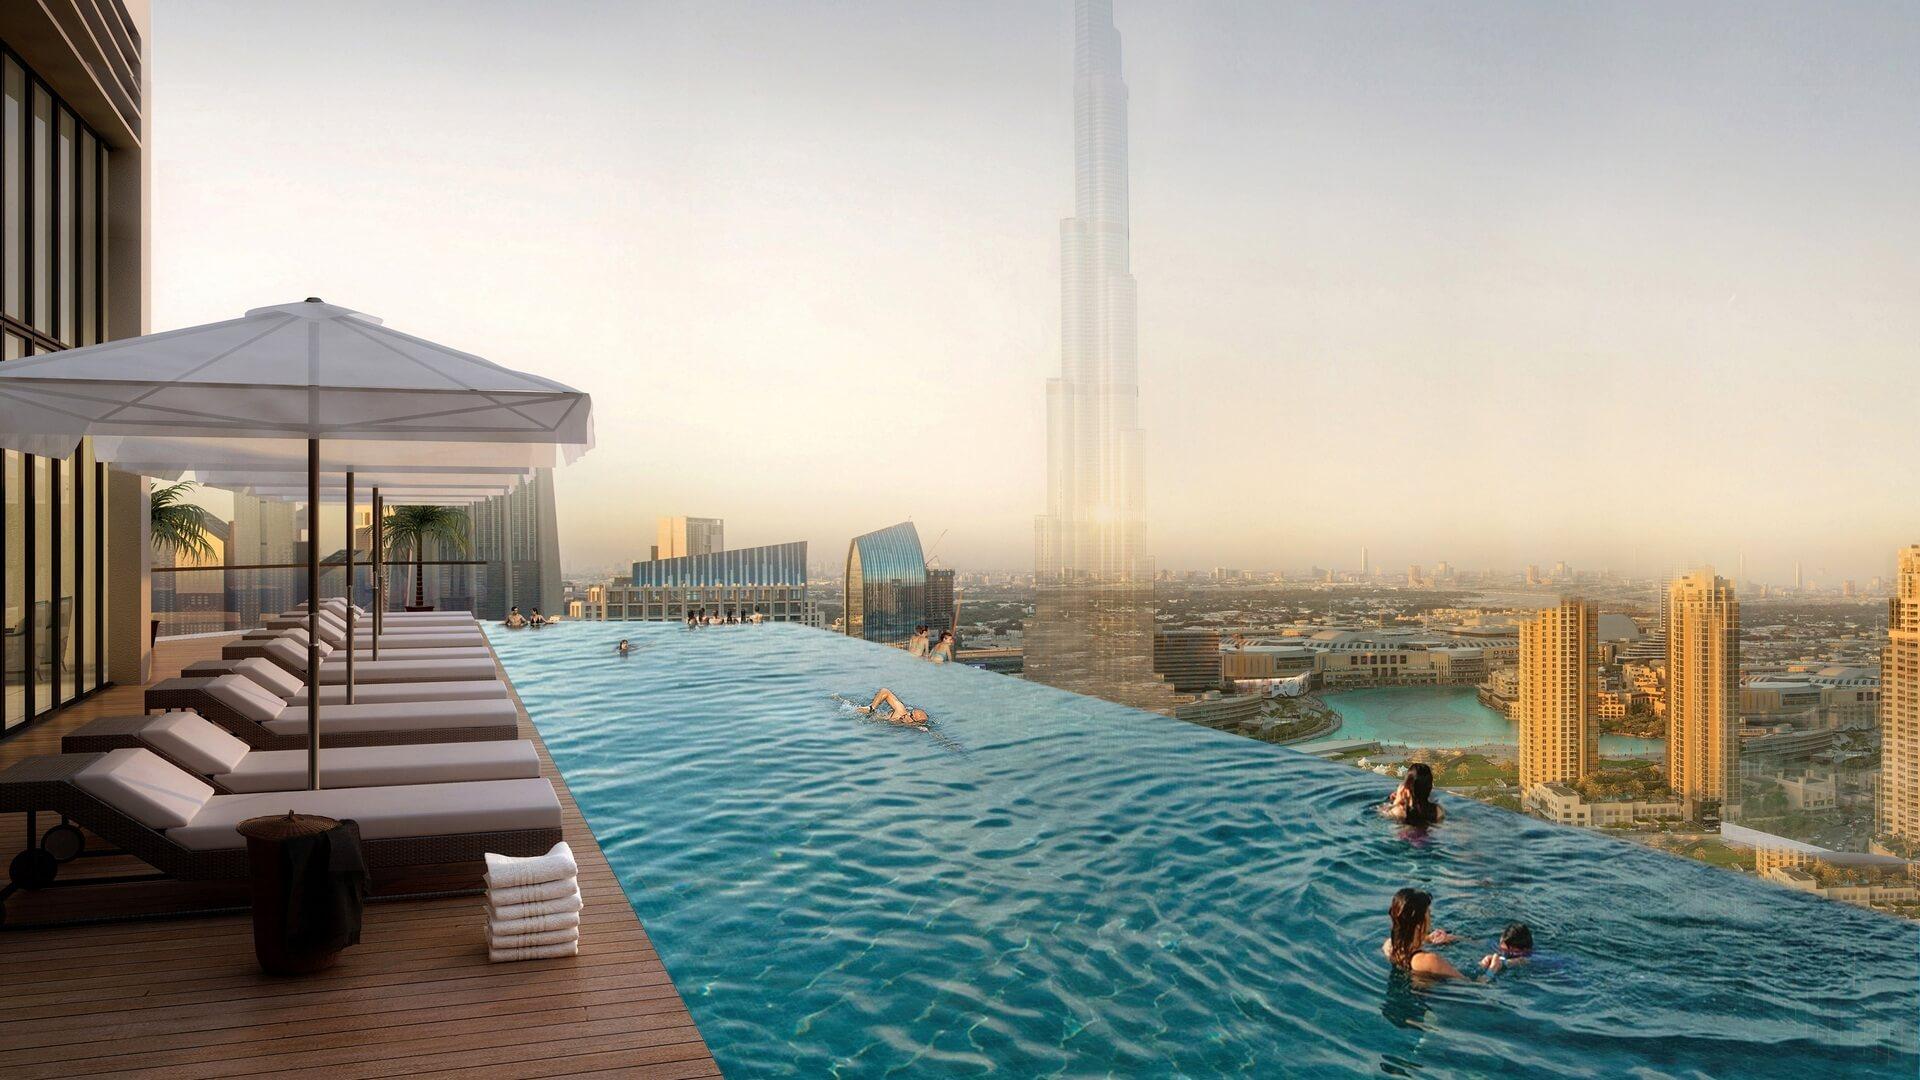 PARAMOUNT TOWER HOTEL & RESIDENCES, Business Bay, Dubai, EAU – foto 2